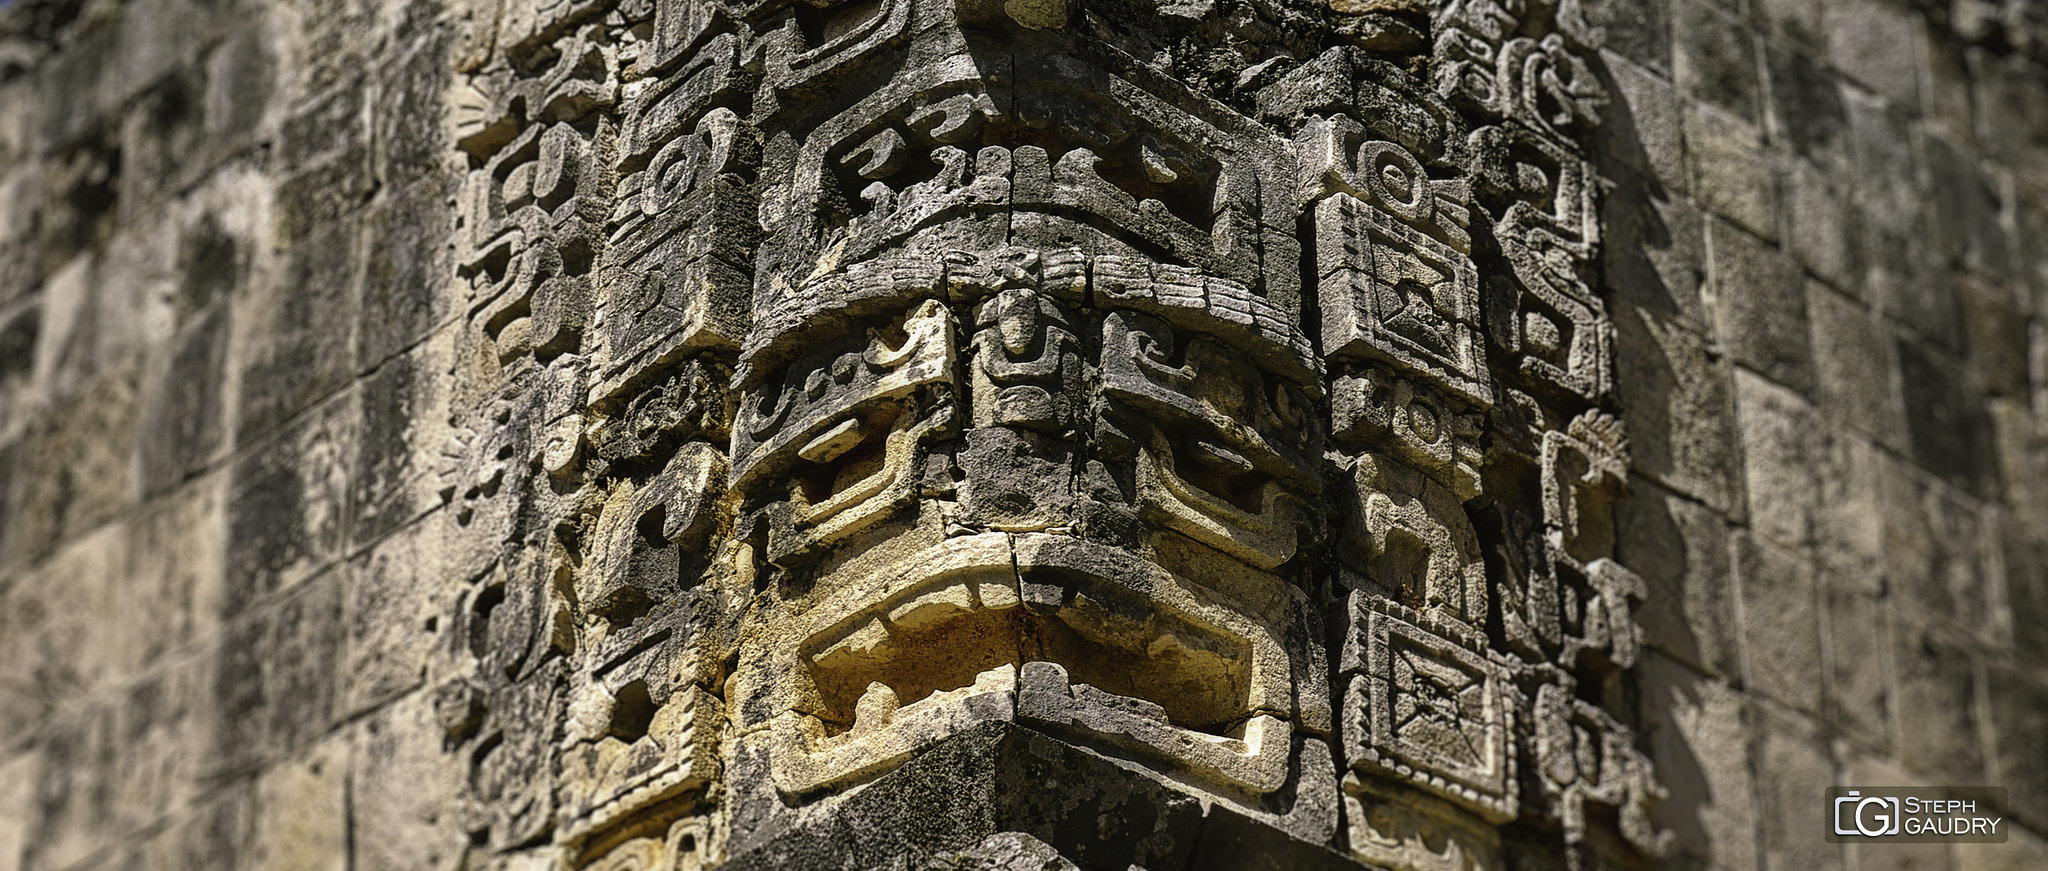 Uxmal - gros plan sur une tête en bas relief [Click to start slideshow]